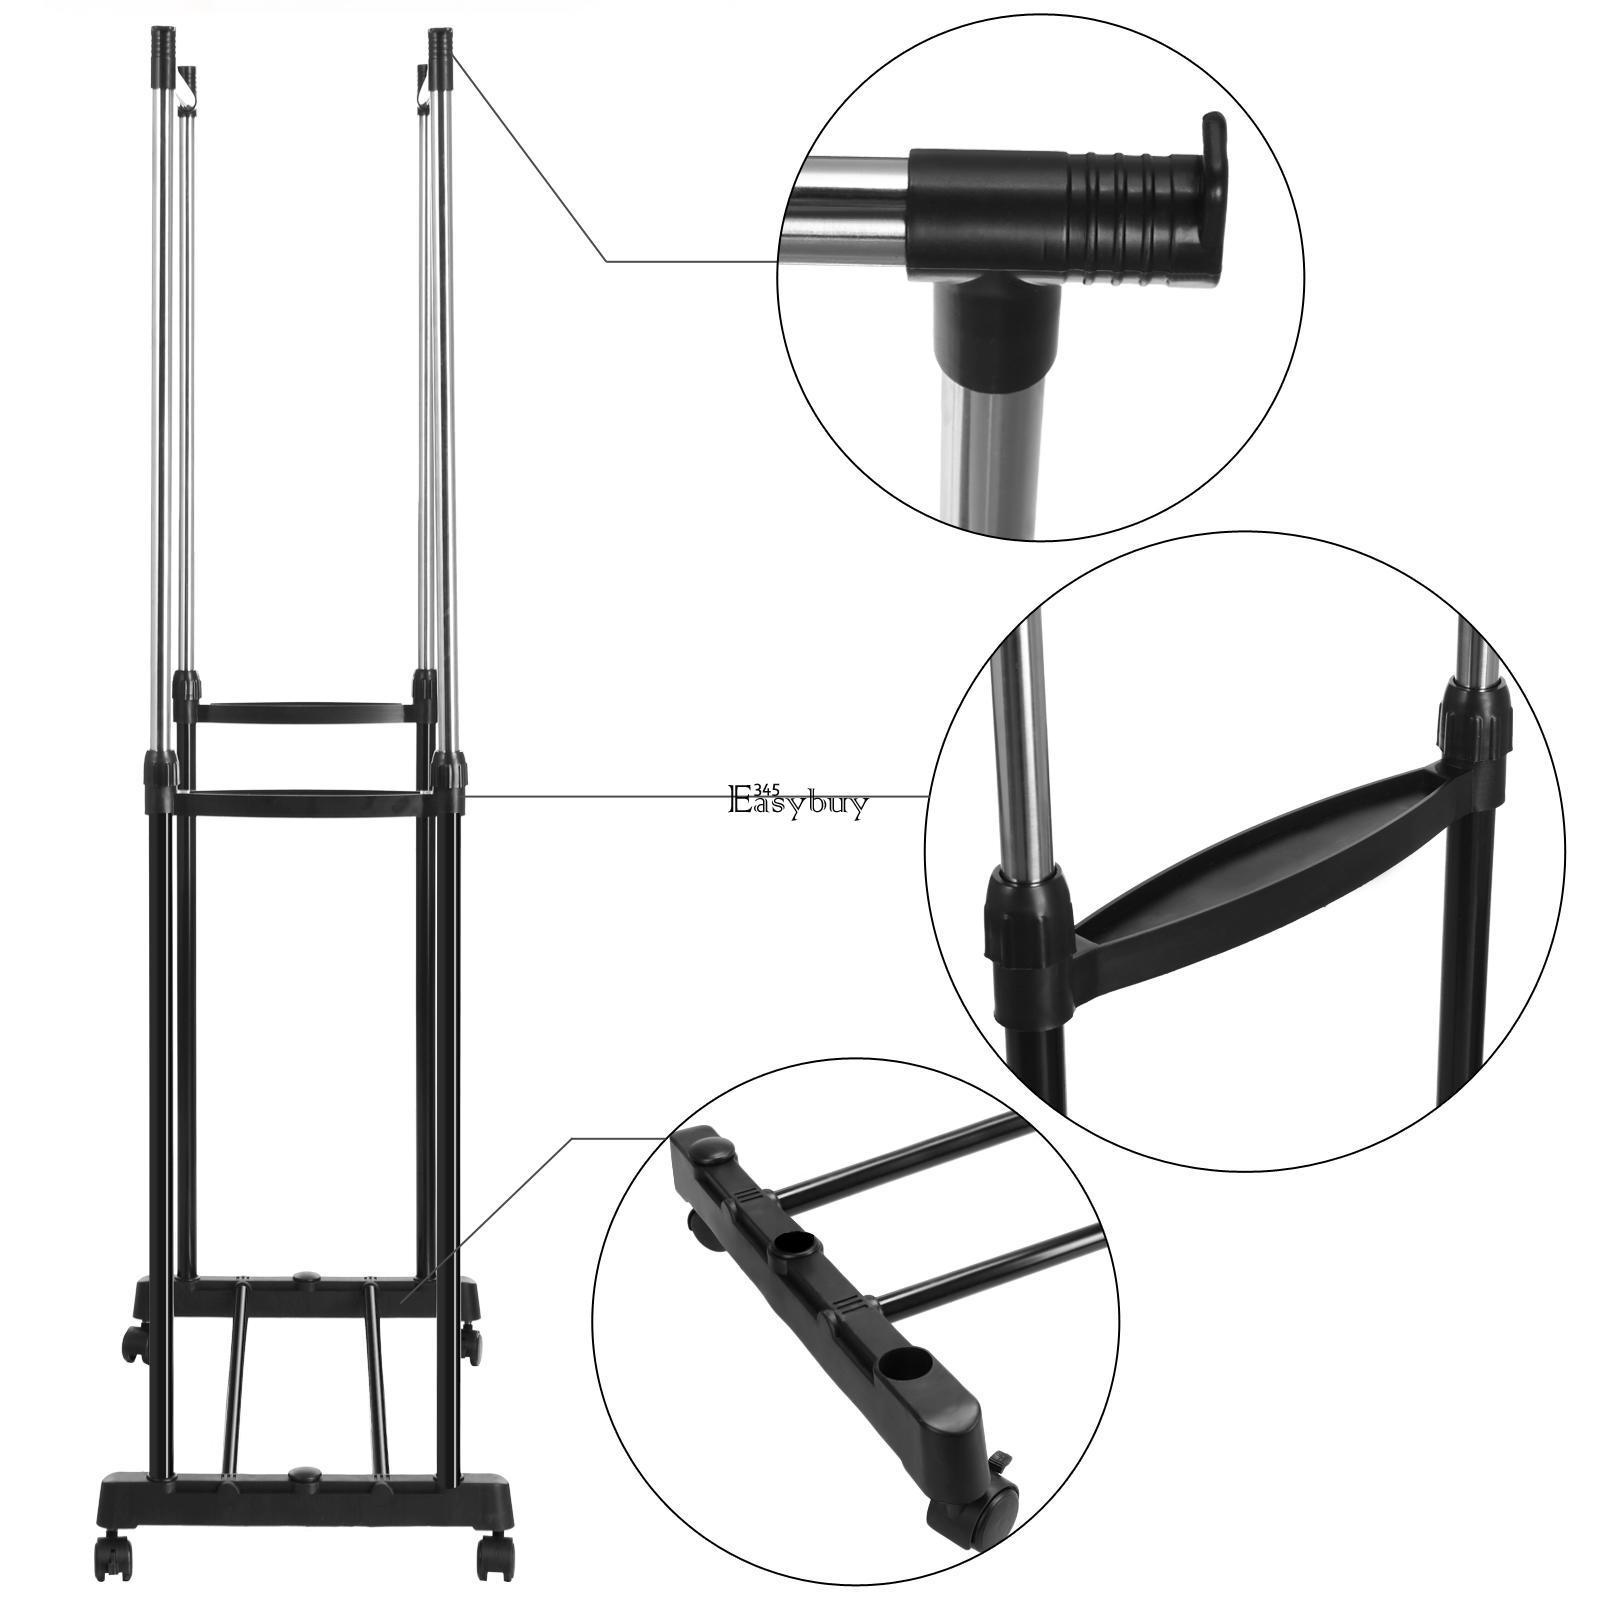 Portable Double Rolling Rail Adjustable Clothes Garment